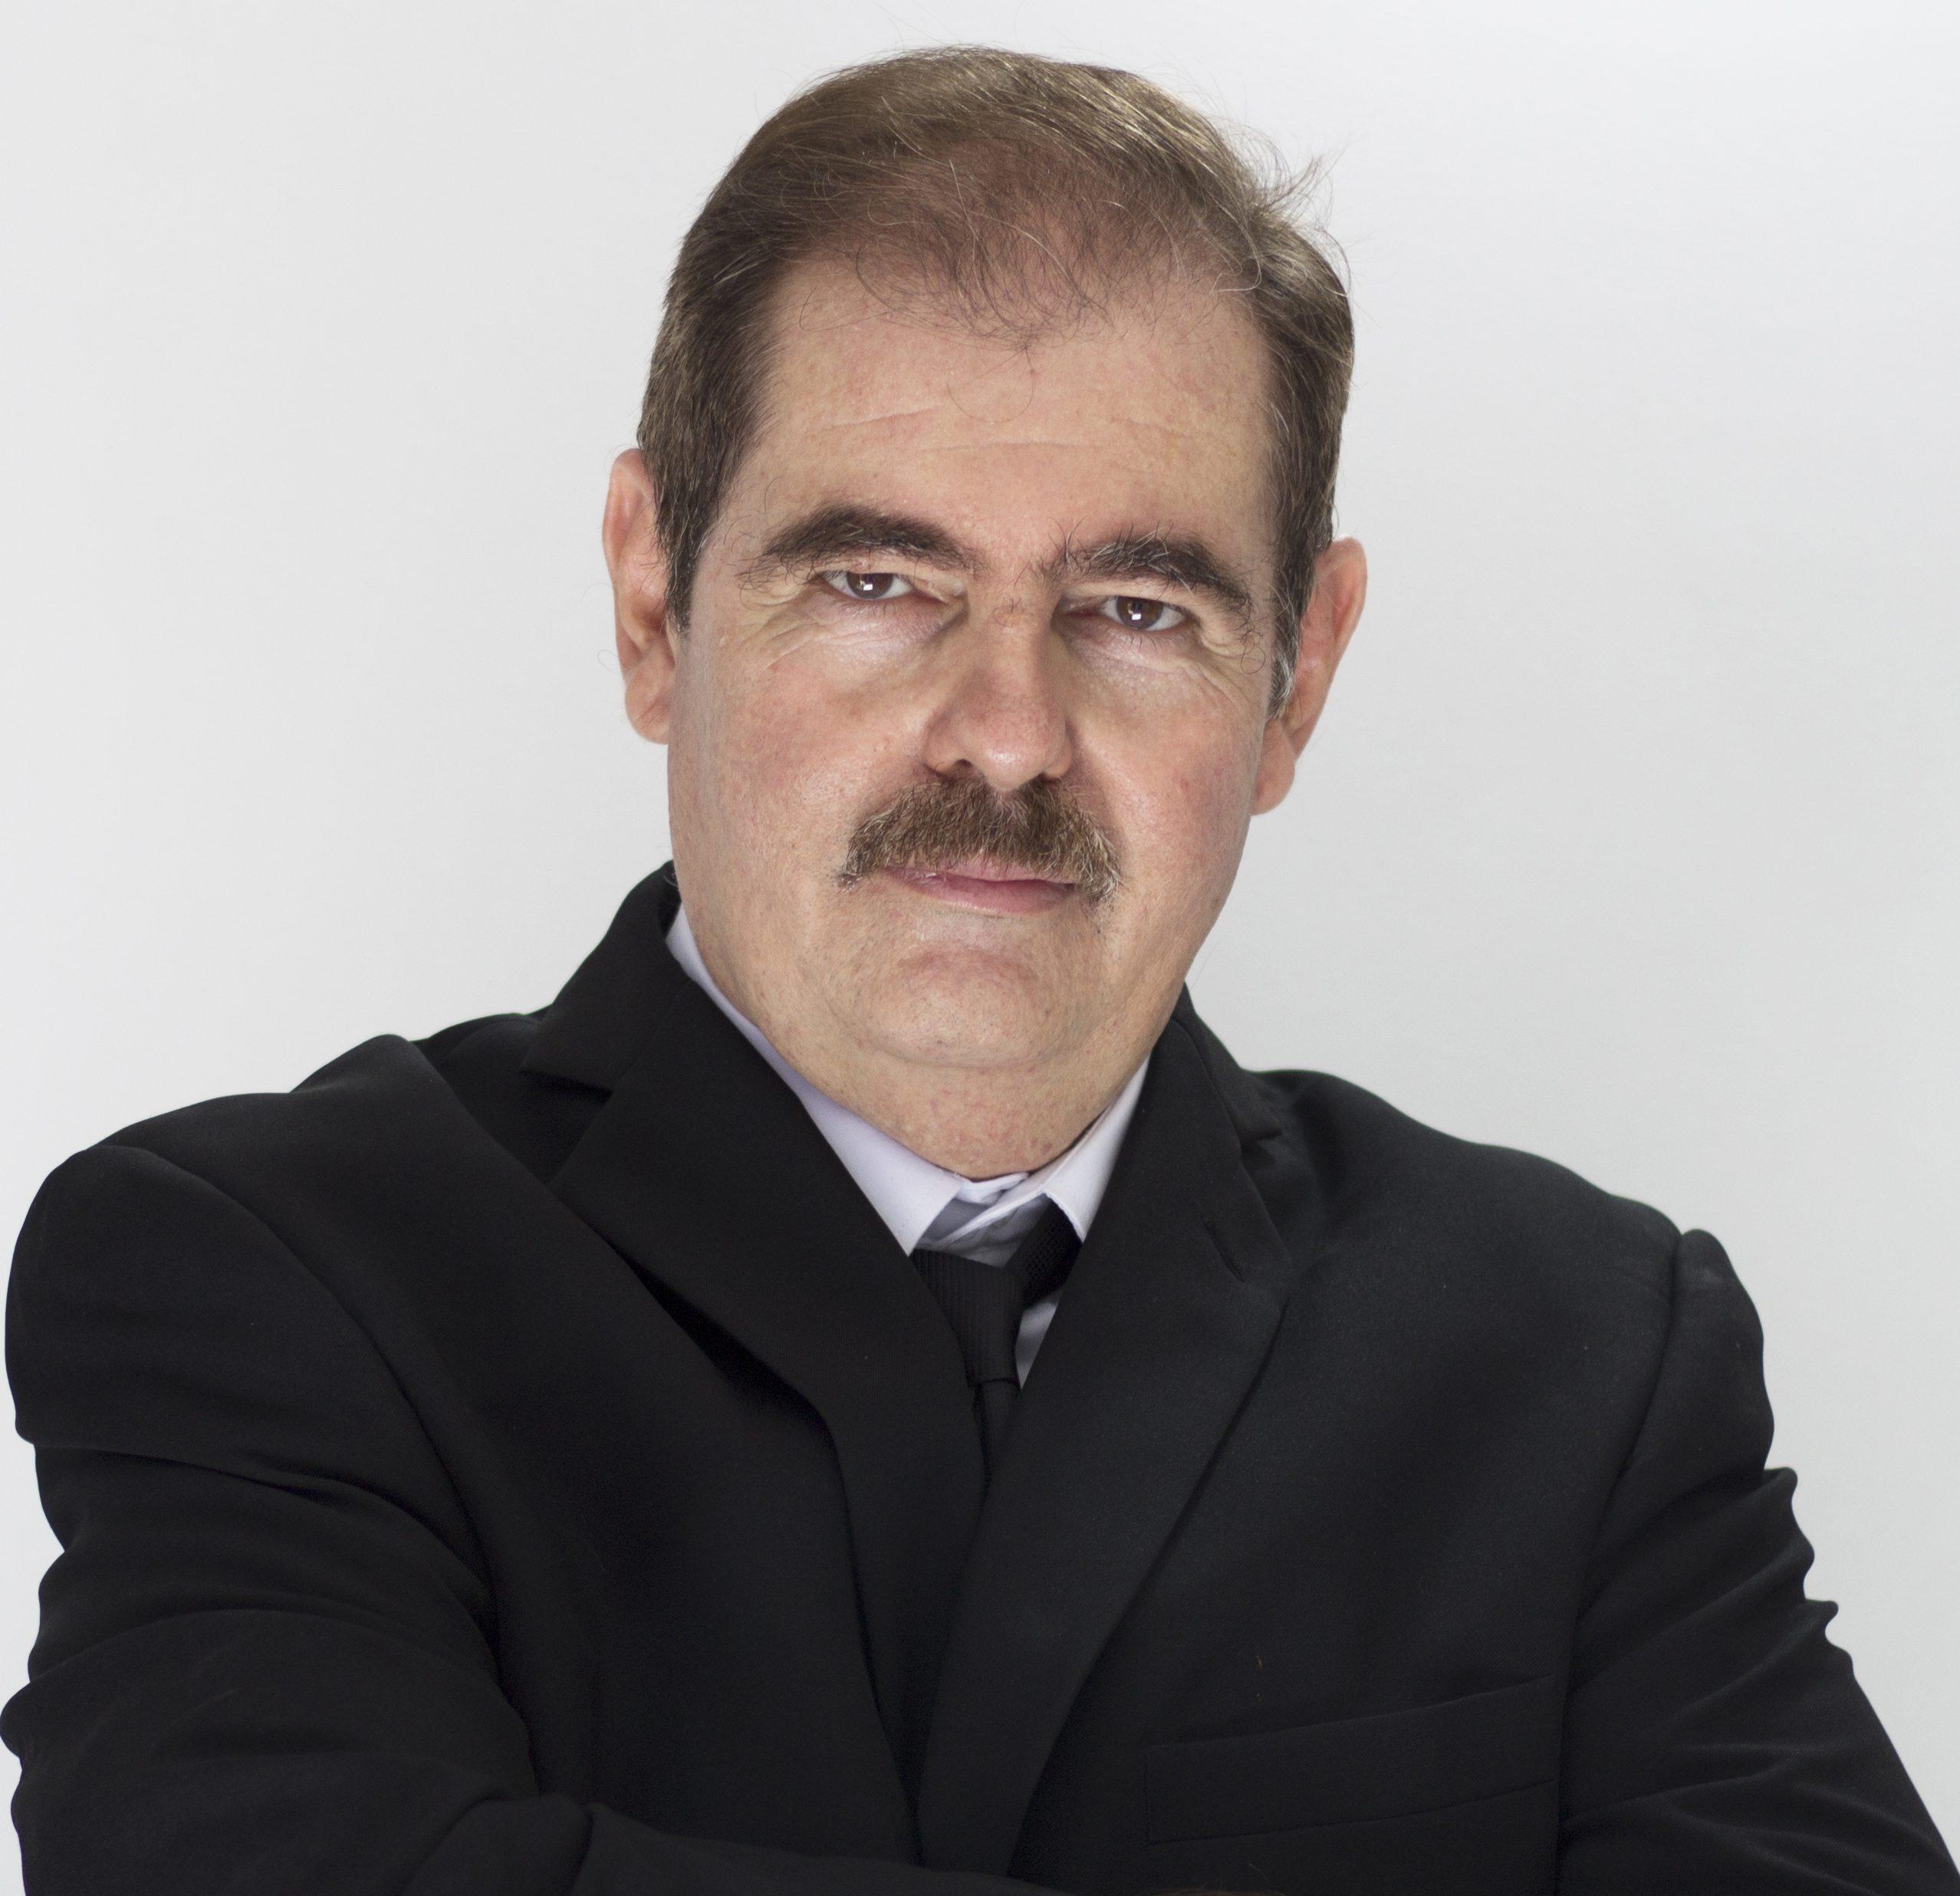 Pedro Paulo Morales.com